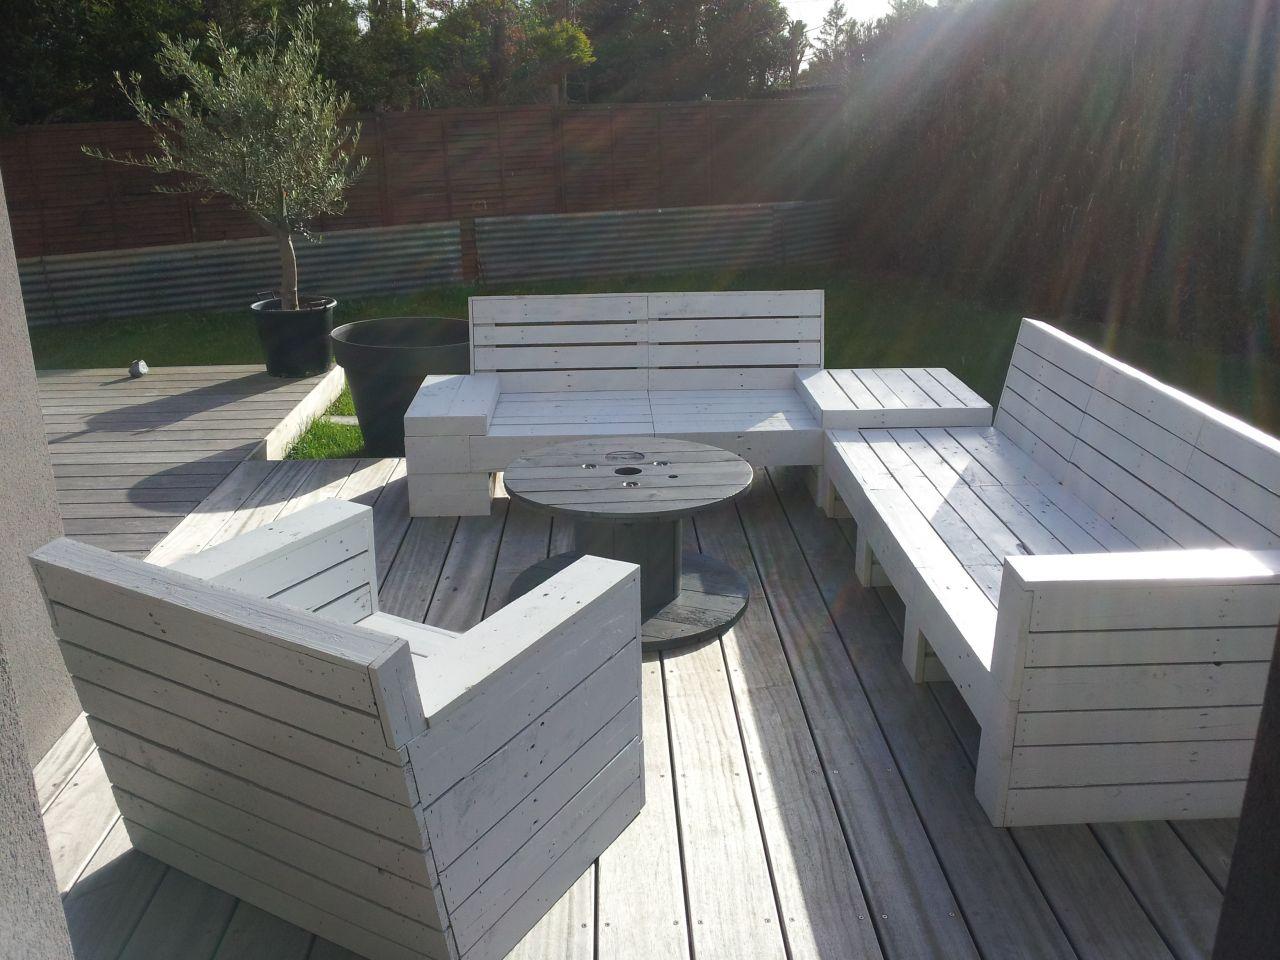 Salon de jardin en palette en bois comment faire - Mailleraye.fr jardin